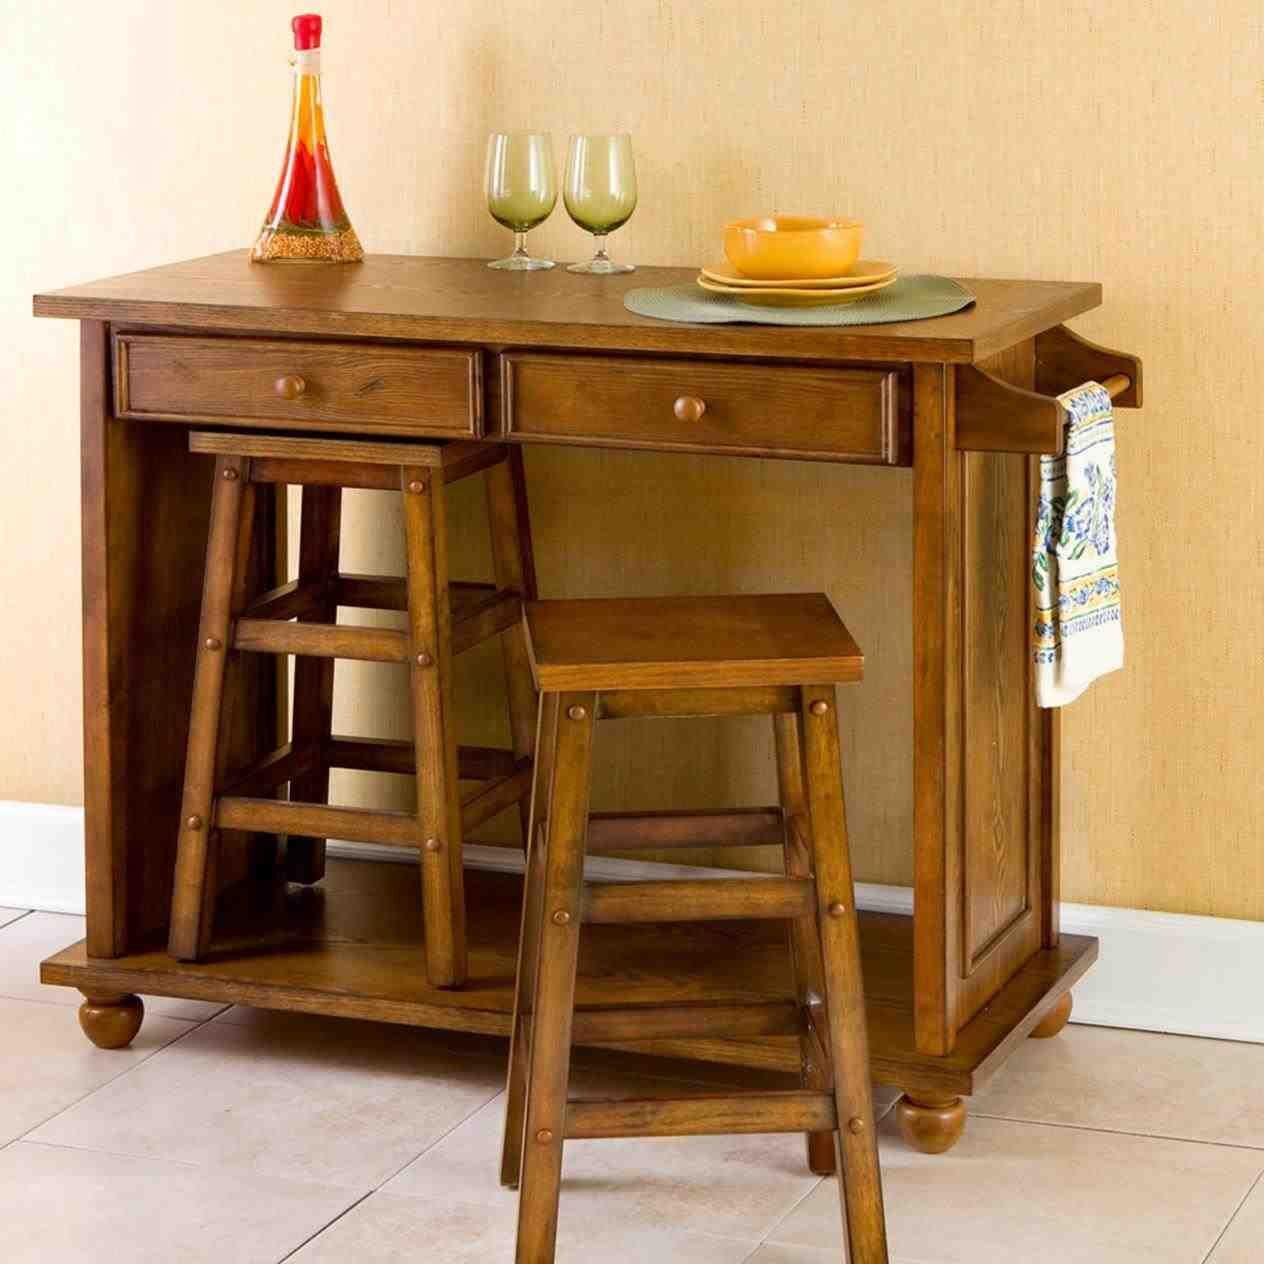 New portable kitchen counter space at temasistemi.net | cocina ...